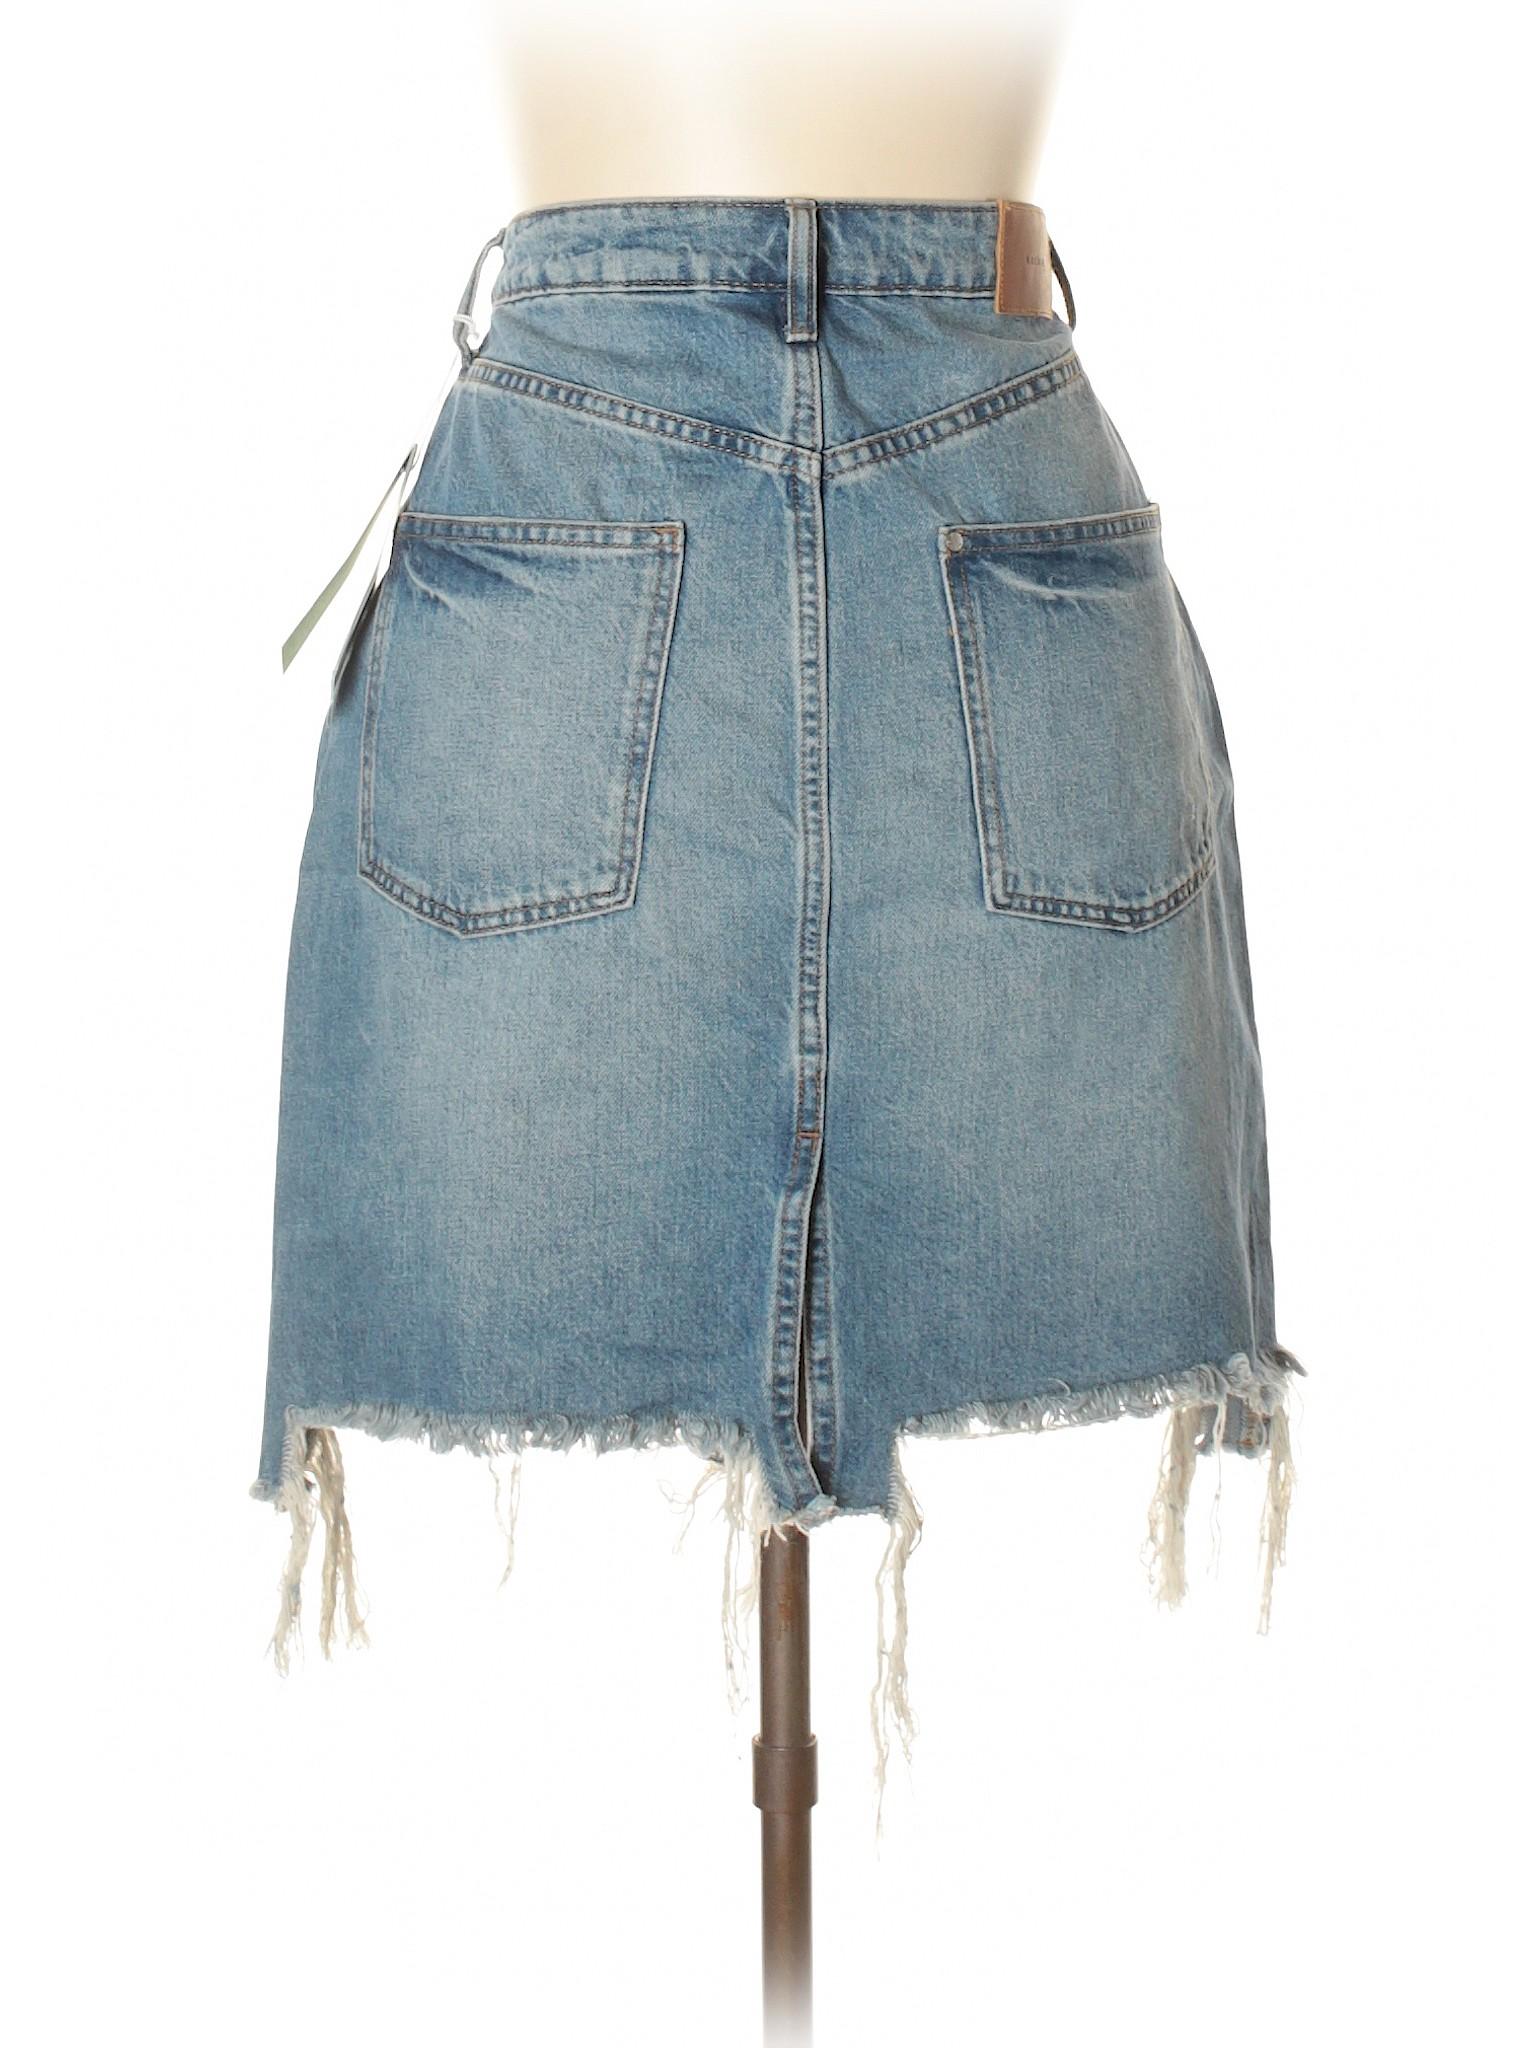 Skirt leisure amp;M Denim H Boutique qWBwHFWIn